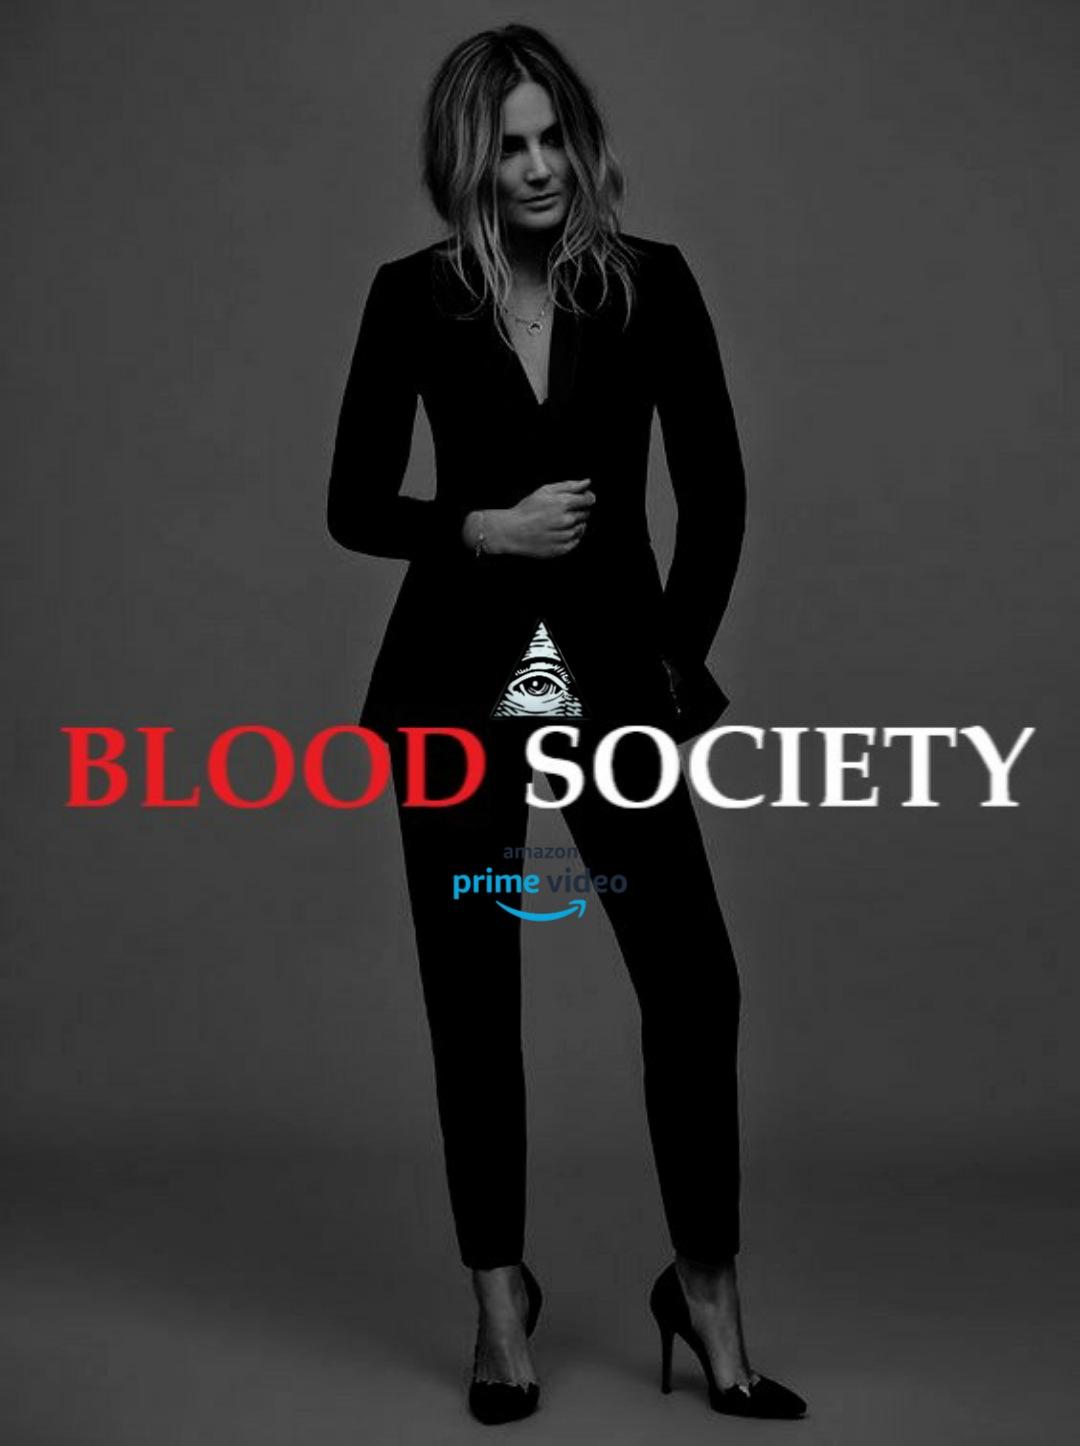 Blood Society